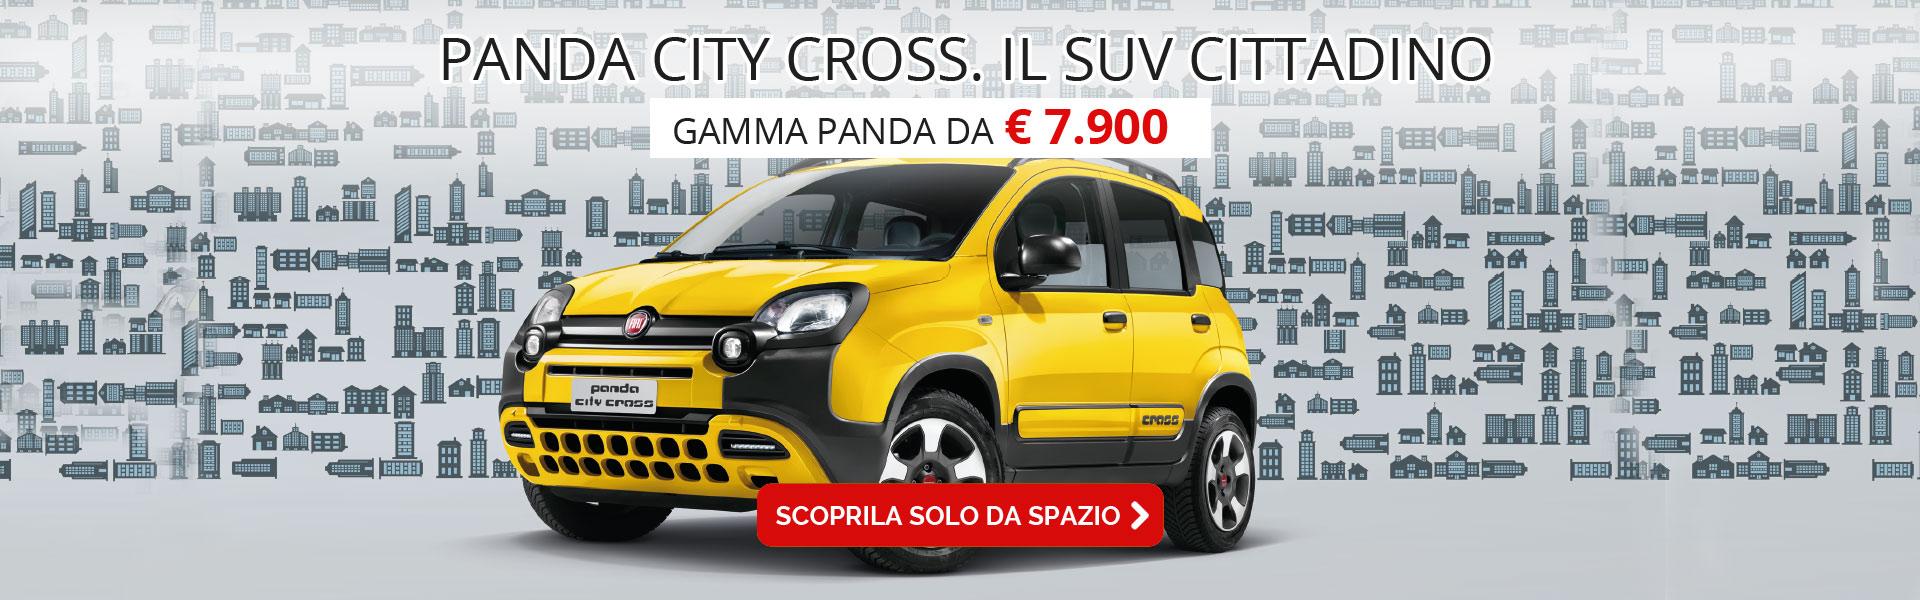 Gamma Panda da 7.900 Euro